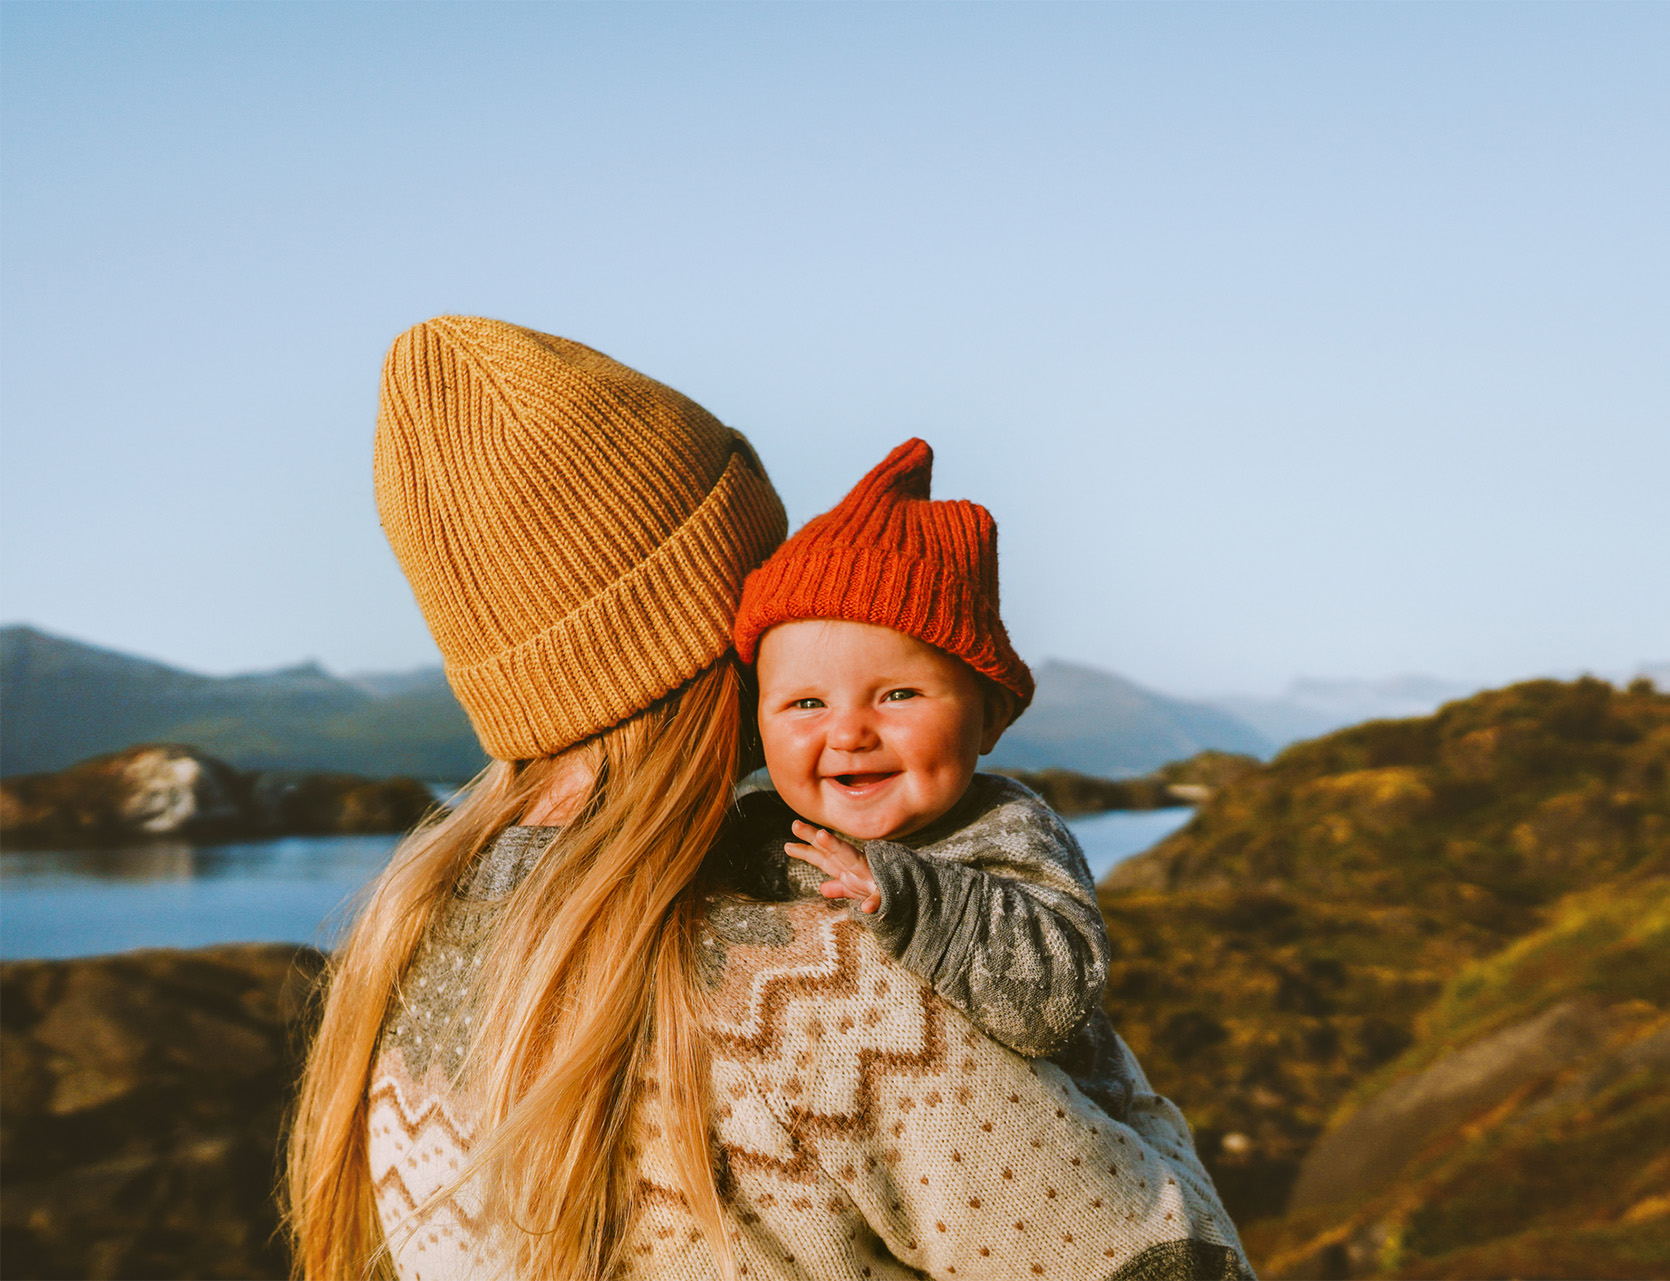 Suche usta u niemowlaka